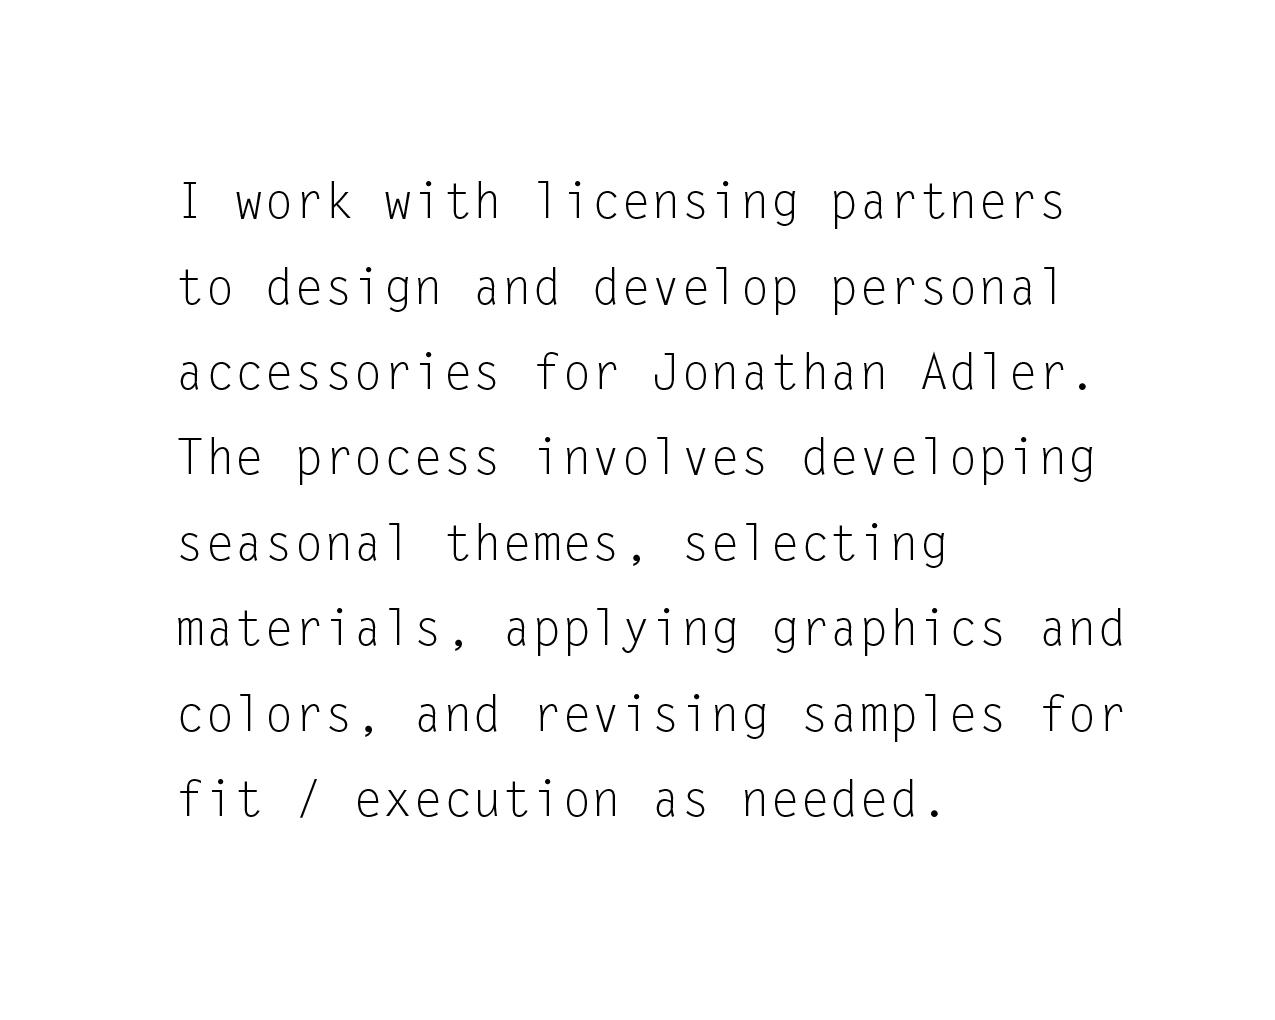 Accessory Design Liz Korutz.jpg